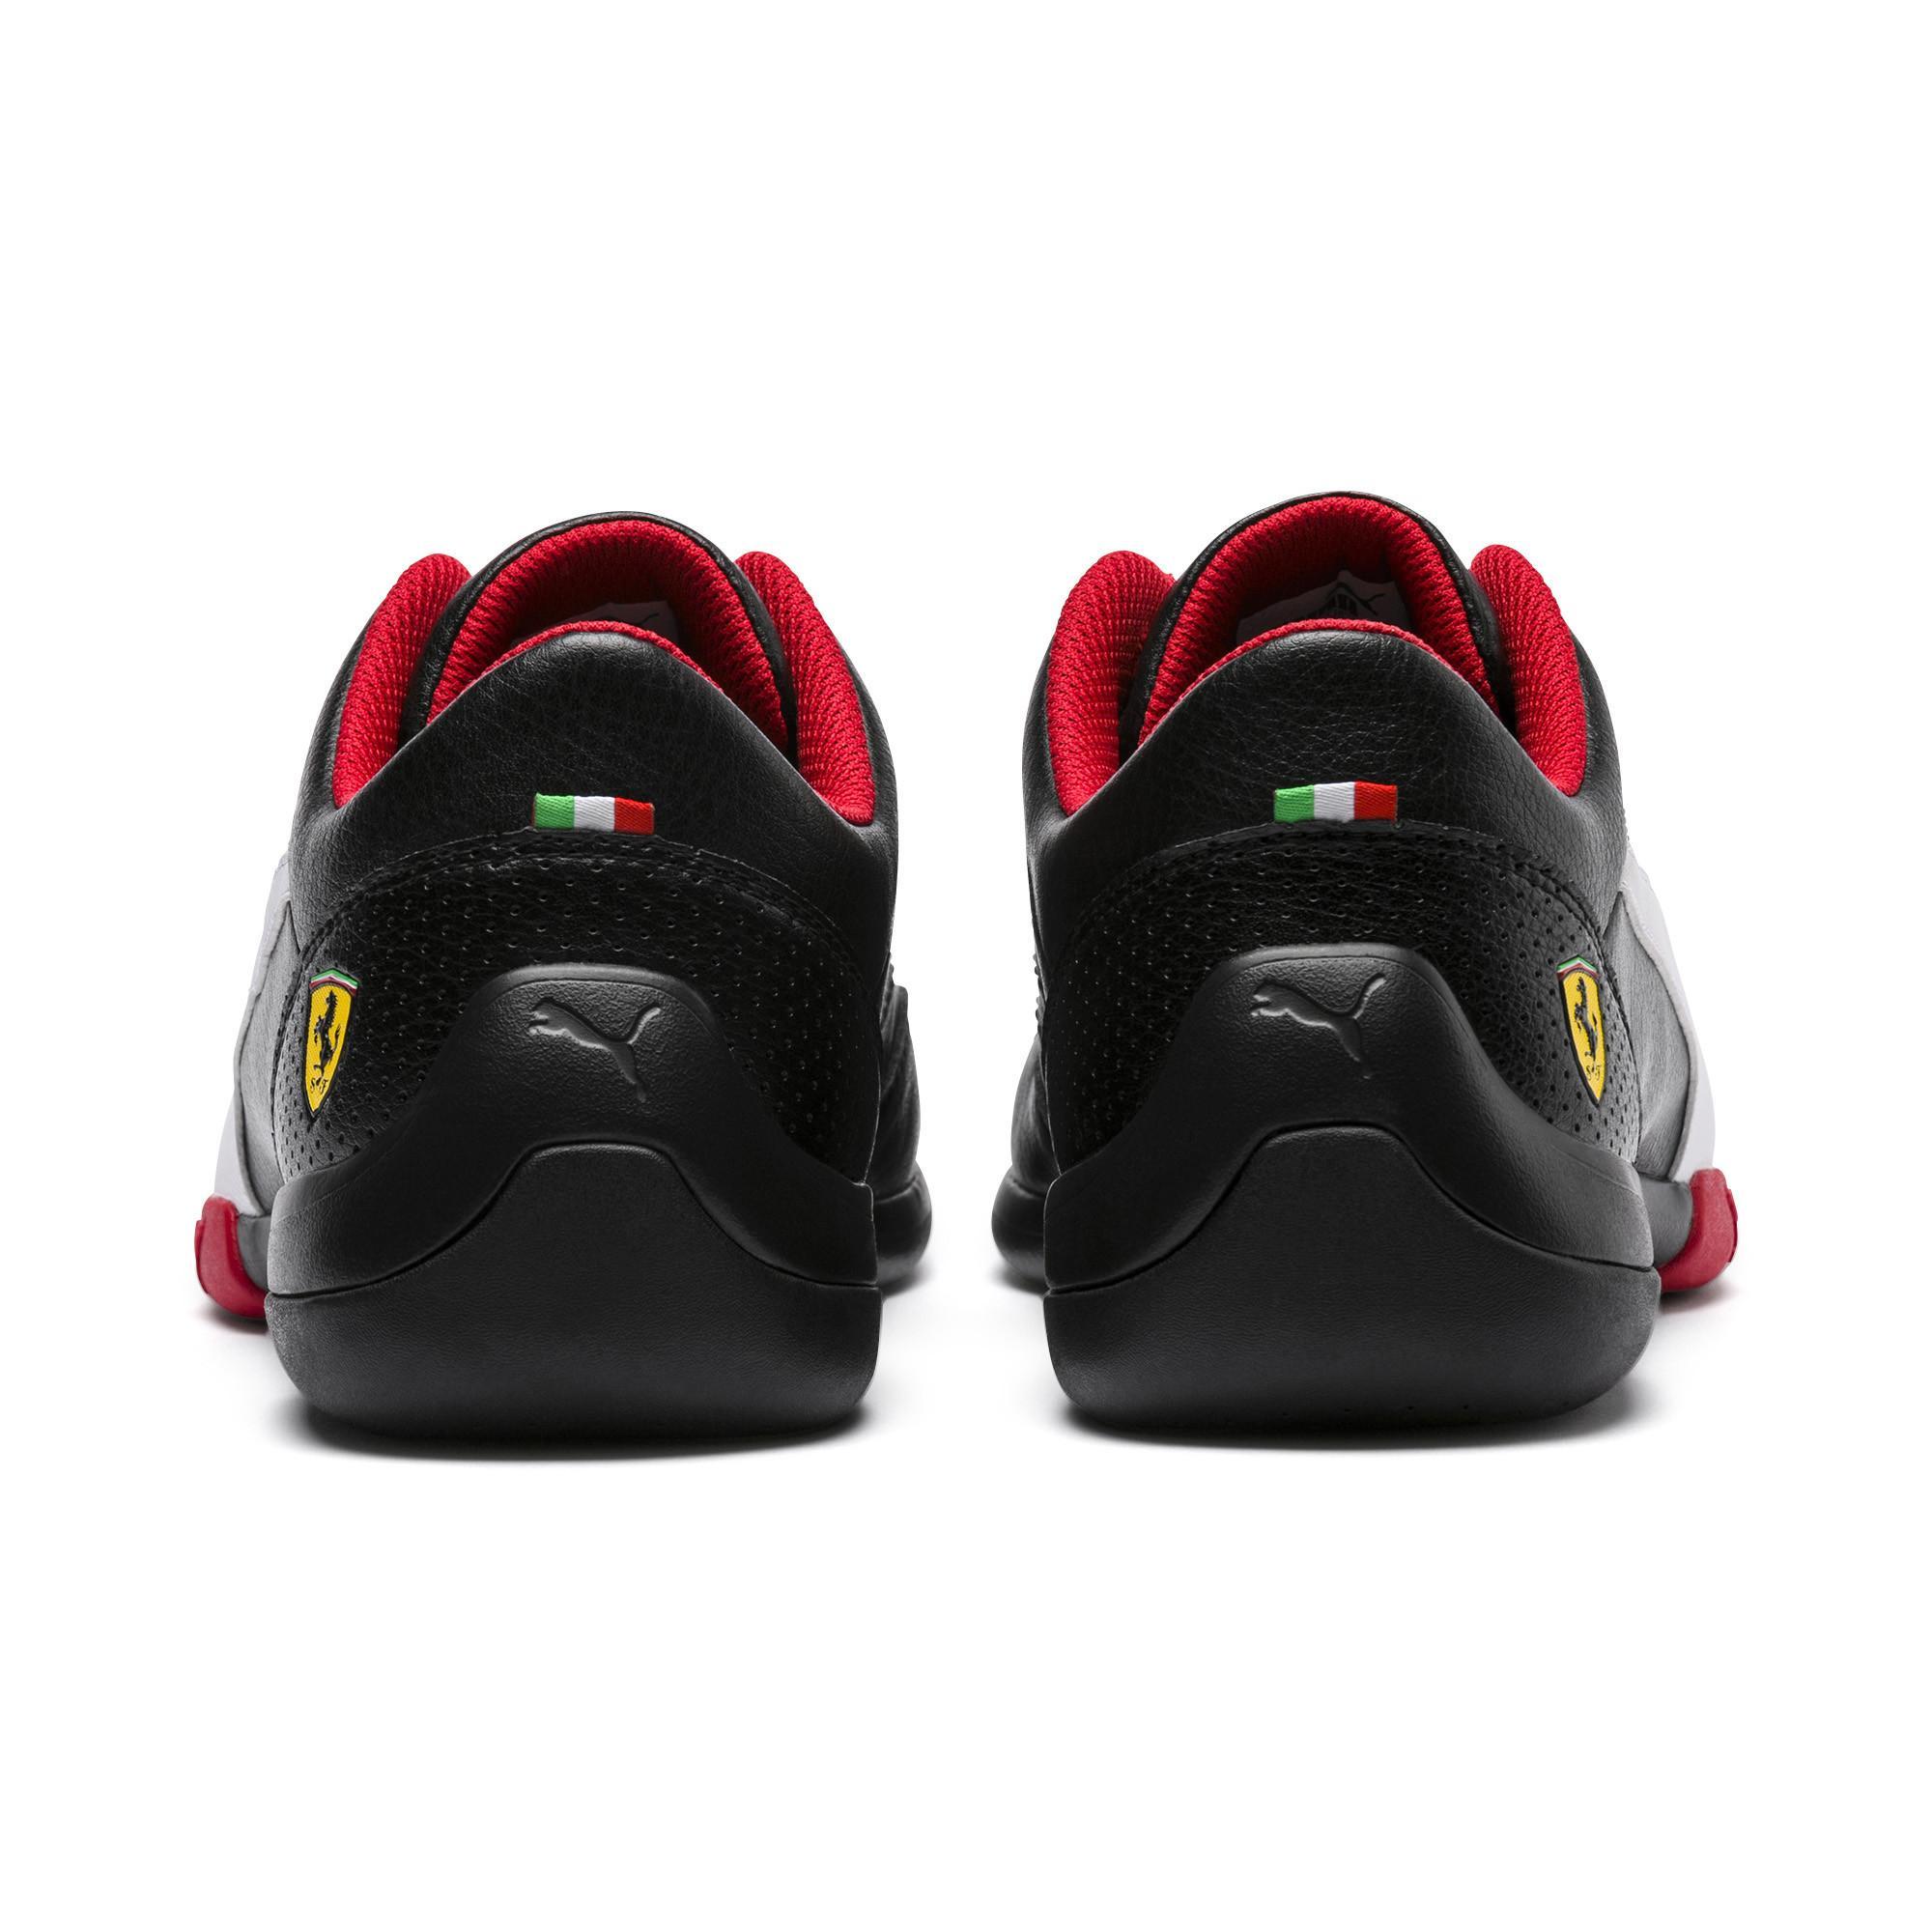 875482b8a2b75f PUMA - Black Scuderia Ferrari Kart Cat Iii Sneakers for Men - Lyst. View  fullscreen